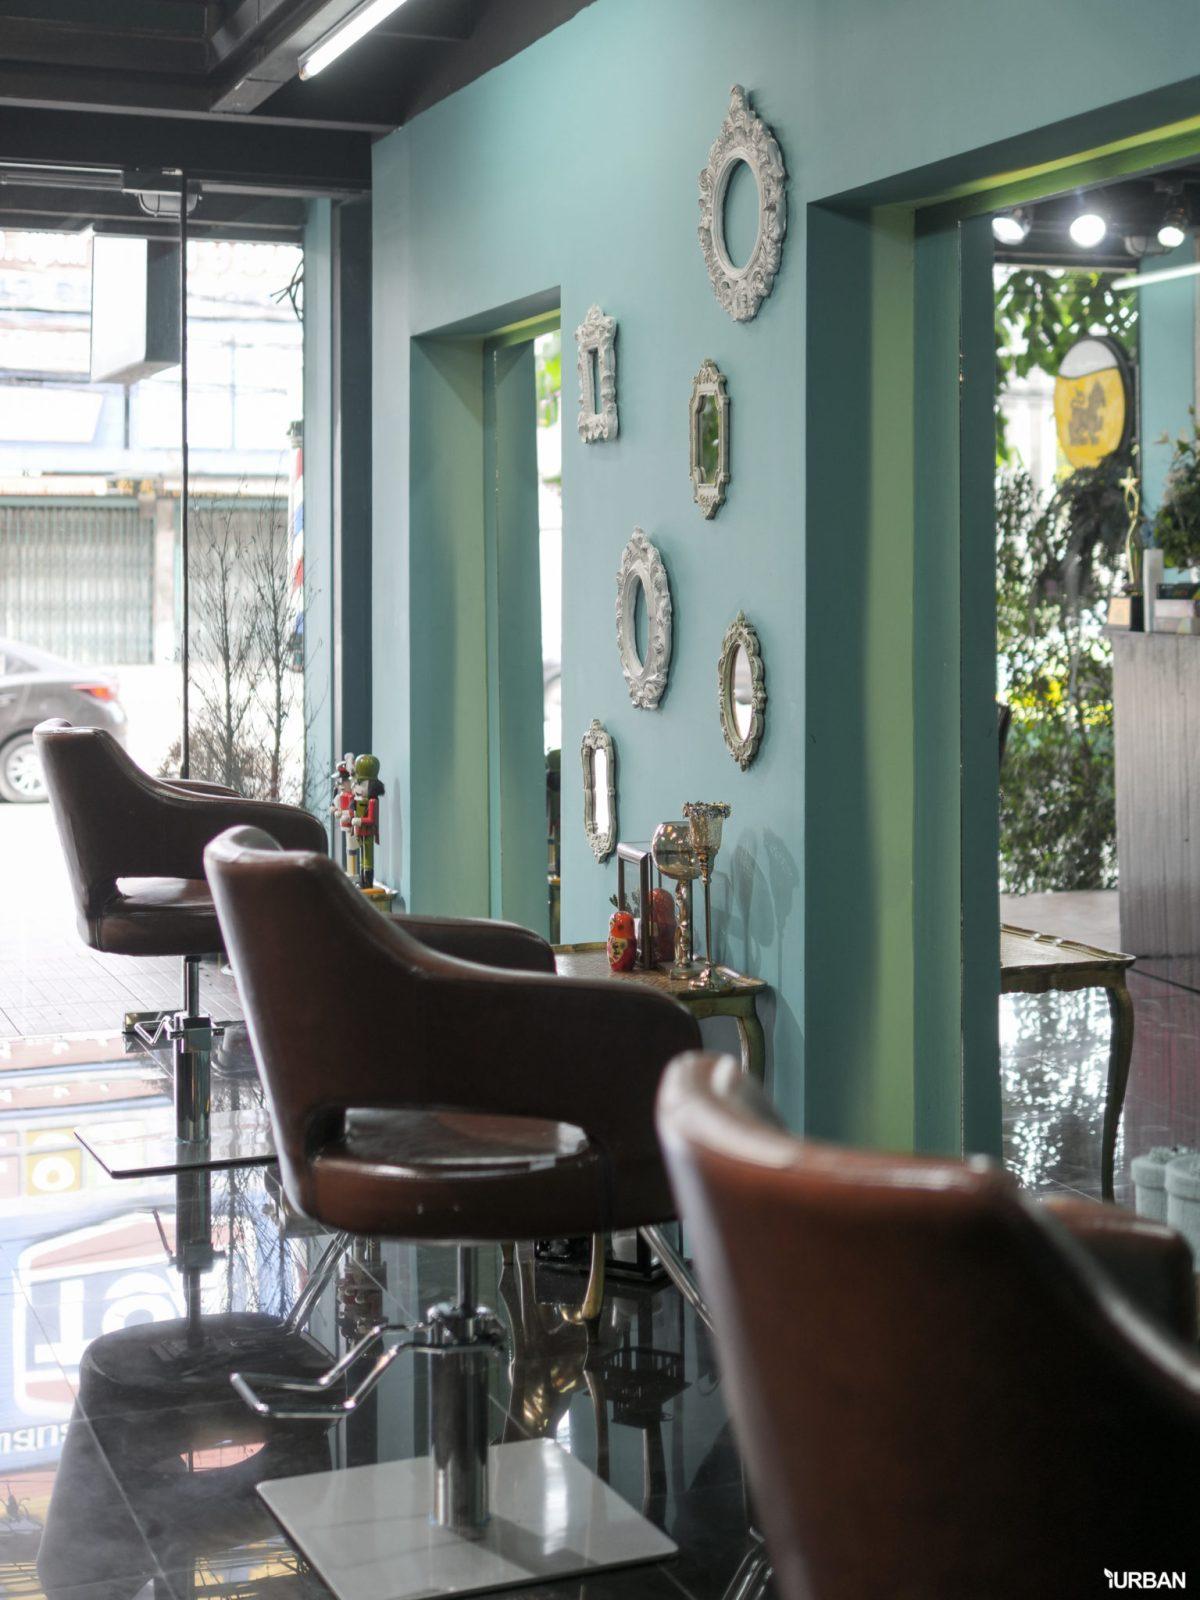 "7 Simply Creative Cafe & Bar ในย่านไลฟ์สไลต์สุดฮิป กับ 24 Hr. Co-Working Space กลาง New Interchange ""รัชดา - ลาดพร้าว"" 72 - cafe"